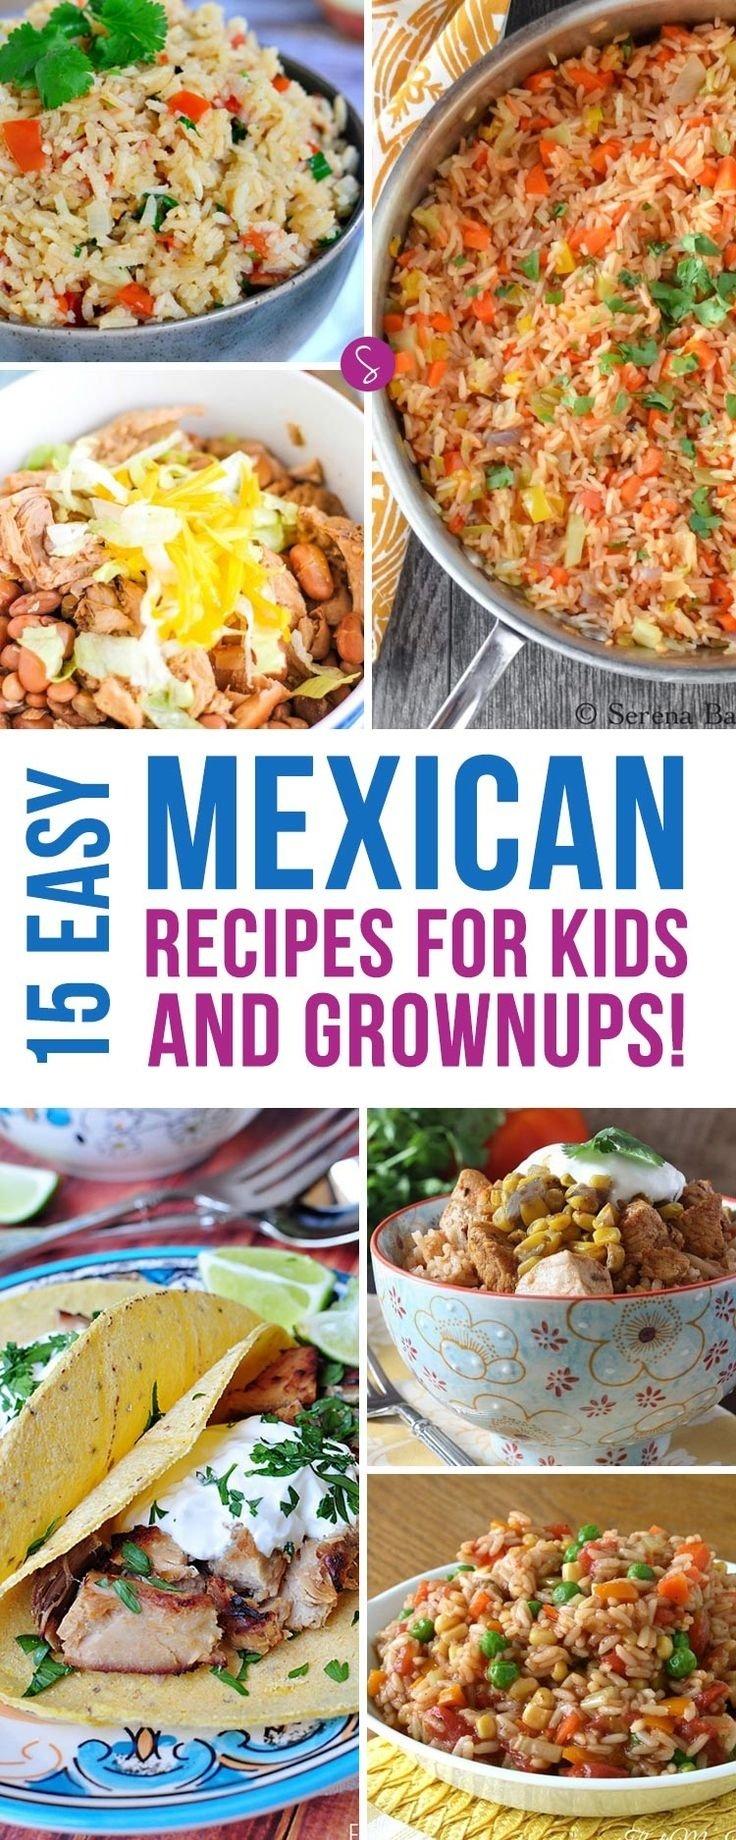 10 Great Quick Kid Friendly Dinner Ideas 440 best kid friendly dinners images on pinterest kid friendly 6 2021